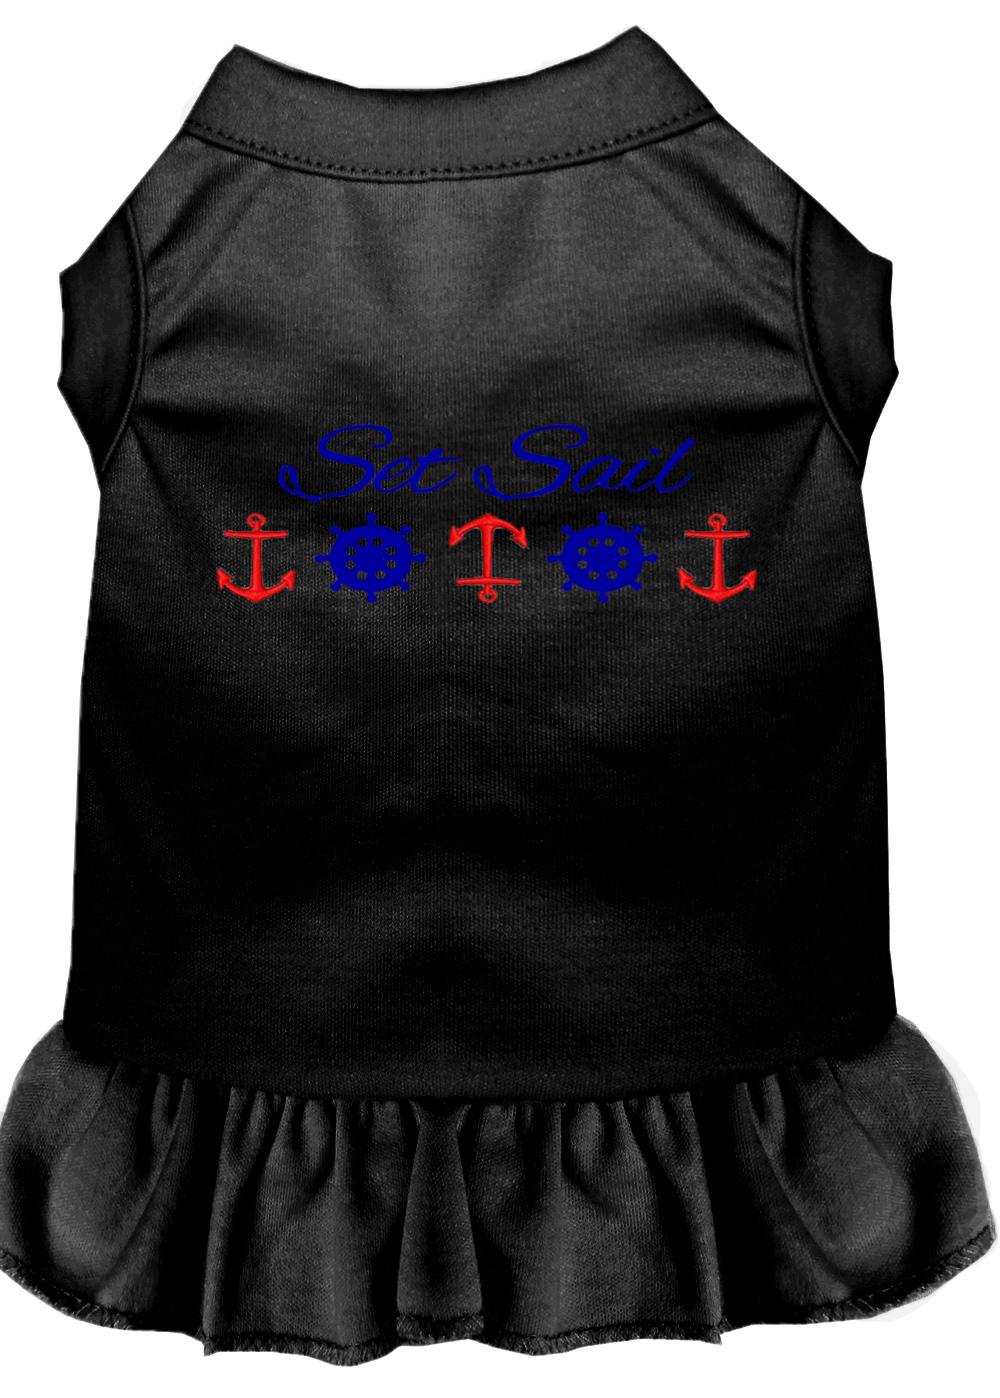 Set sail embroidered dog dress black xxl 18 for Xxl 18 xxl 2012 black